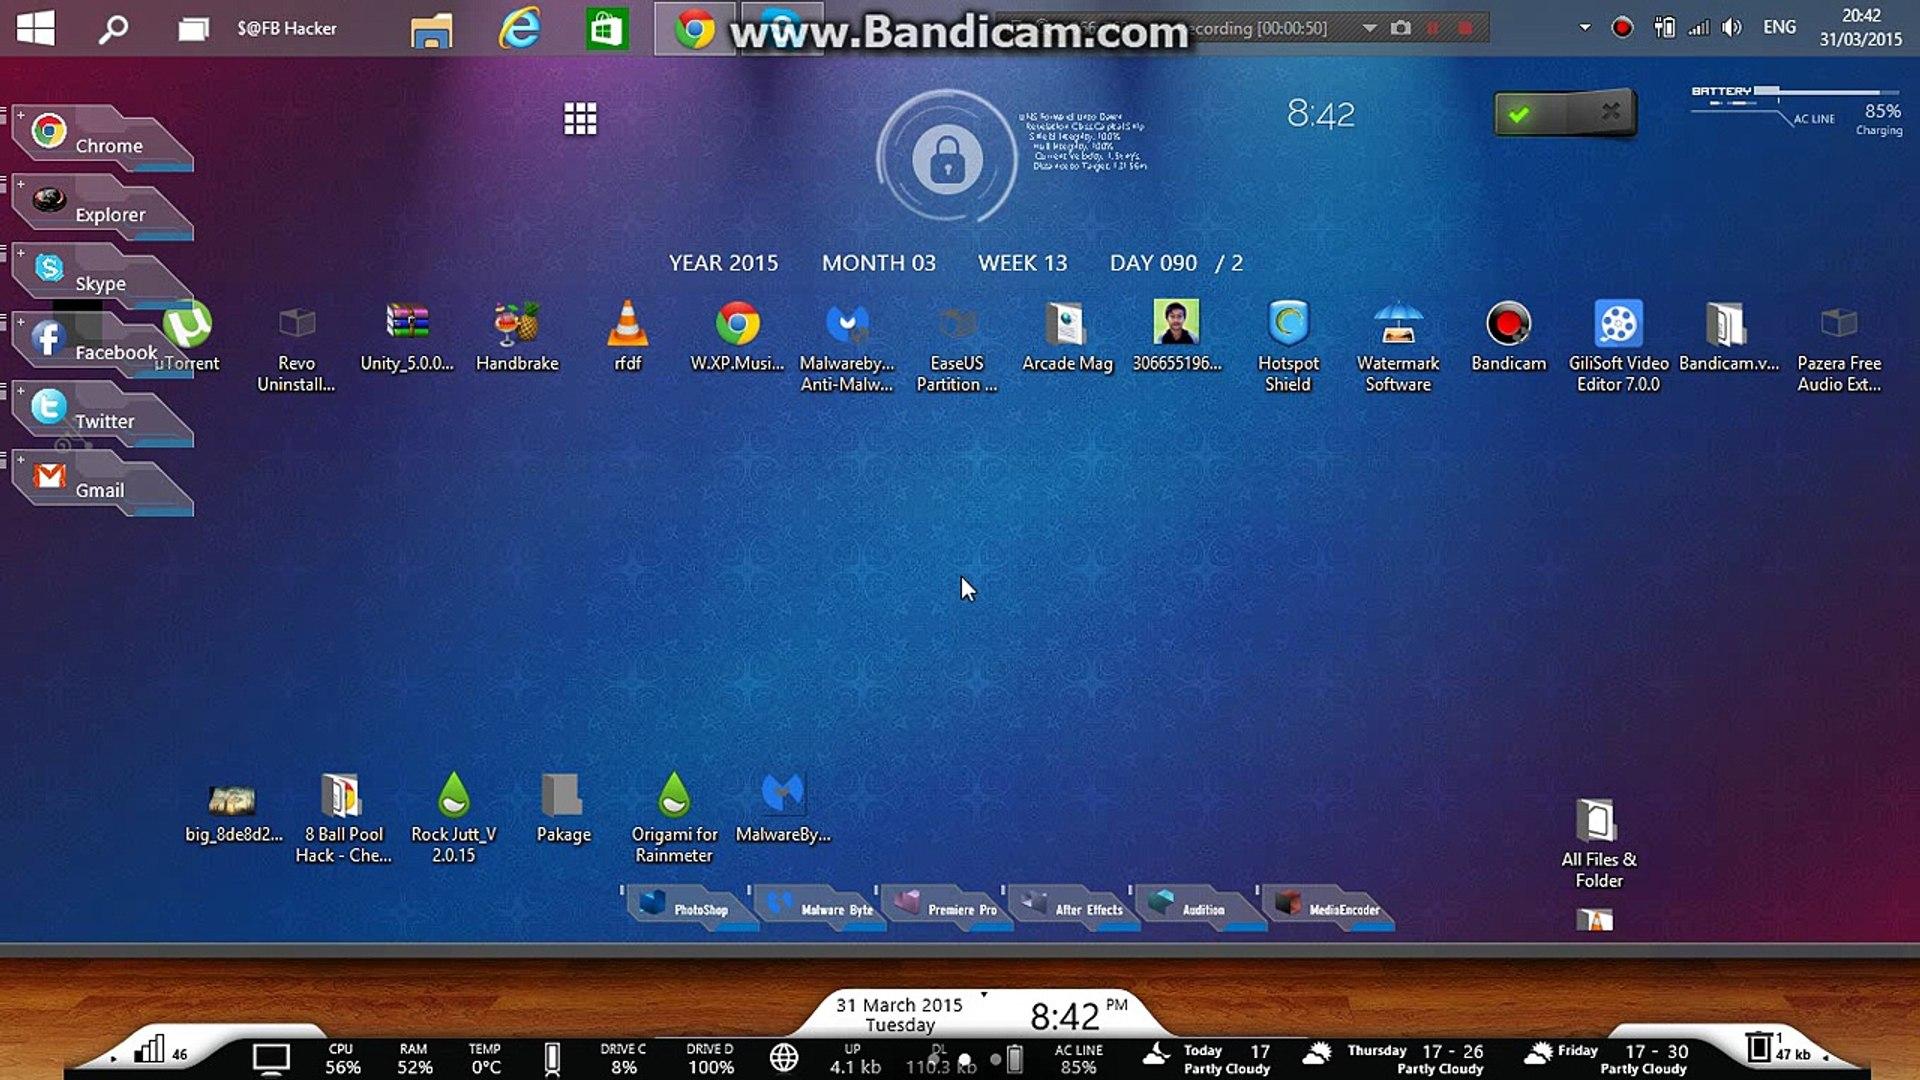 My Desktop Version V2 0 16 - Rainmeter the best Skin 2015 by Rock jutt